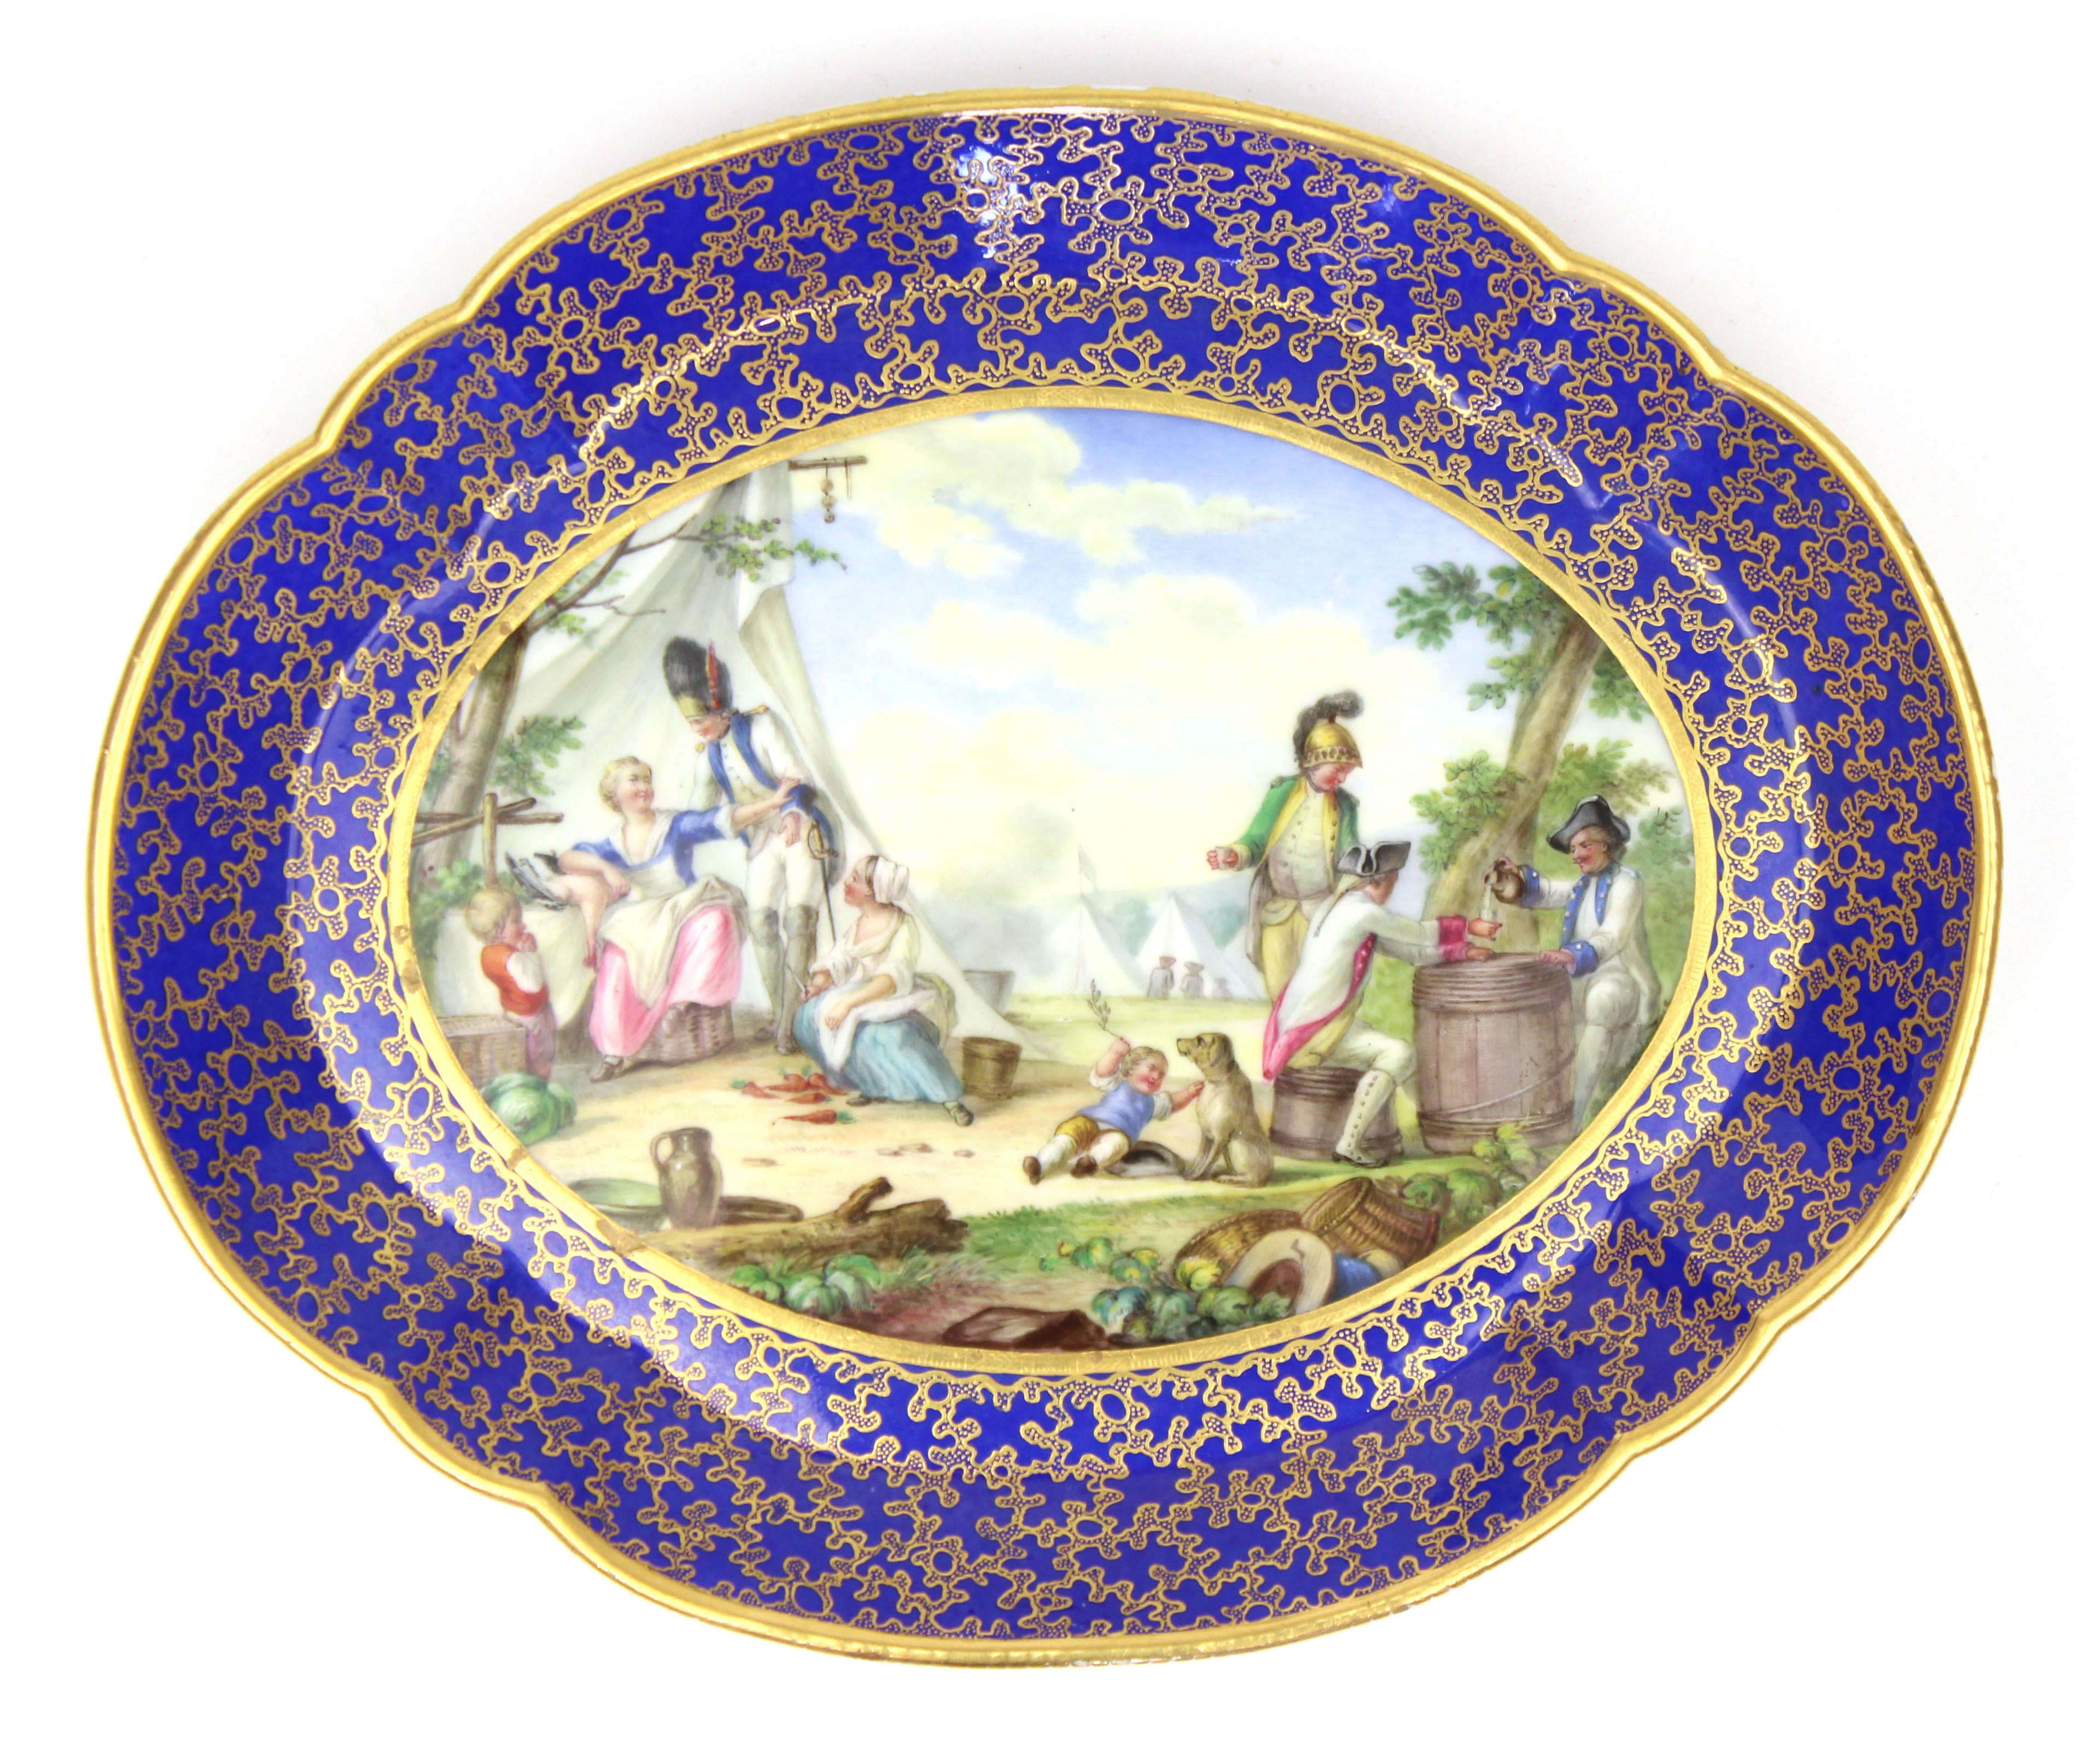 A 19th Century Sevres Style Porcelain Plaque of a Military Encampment